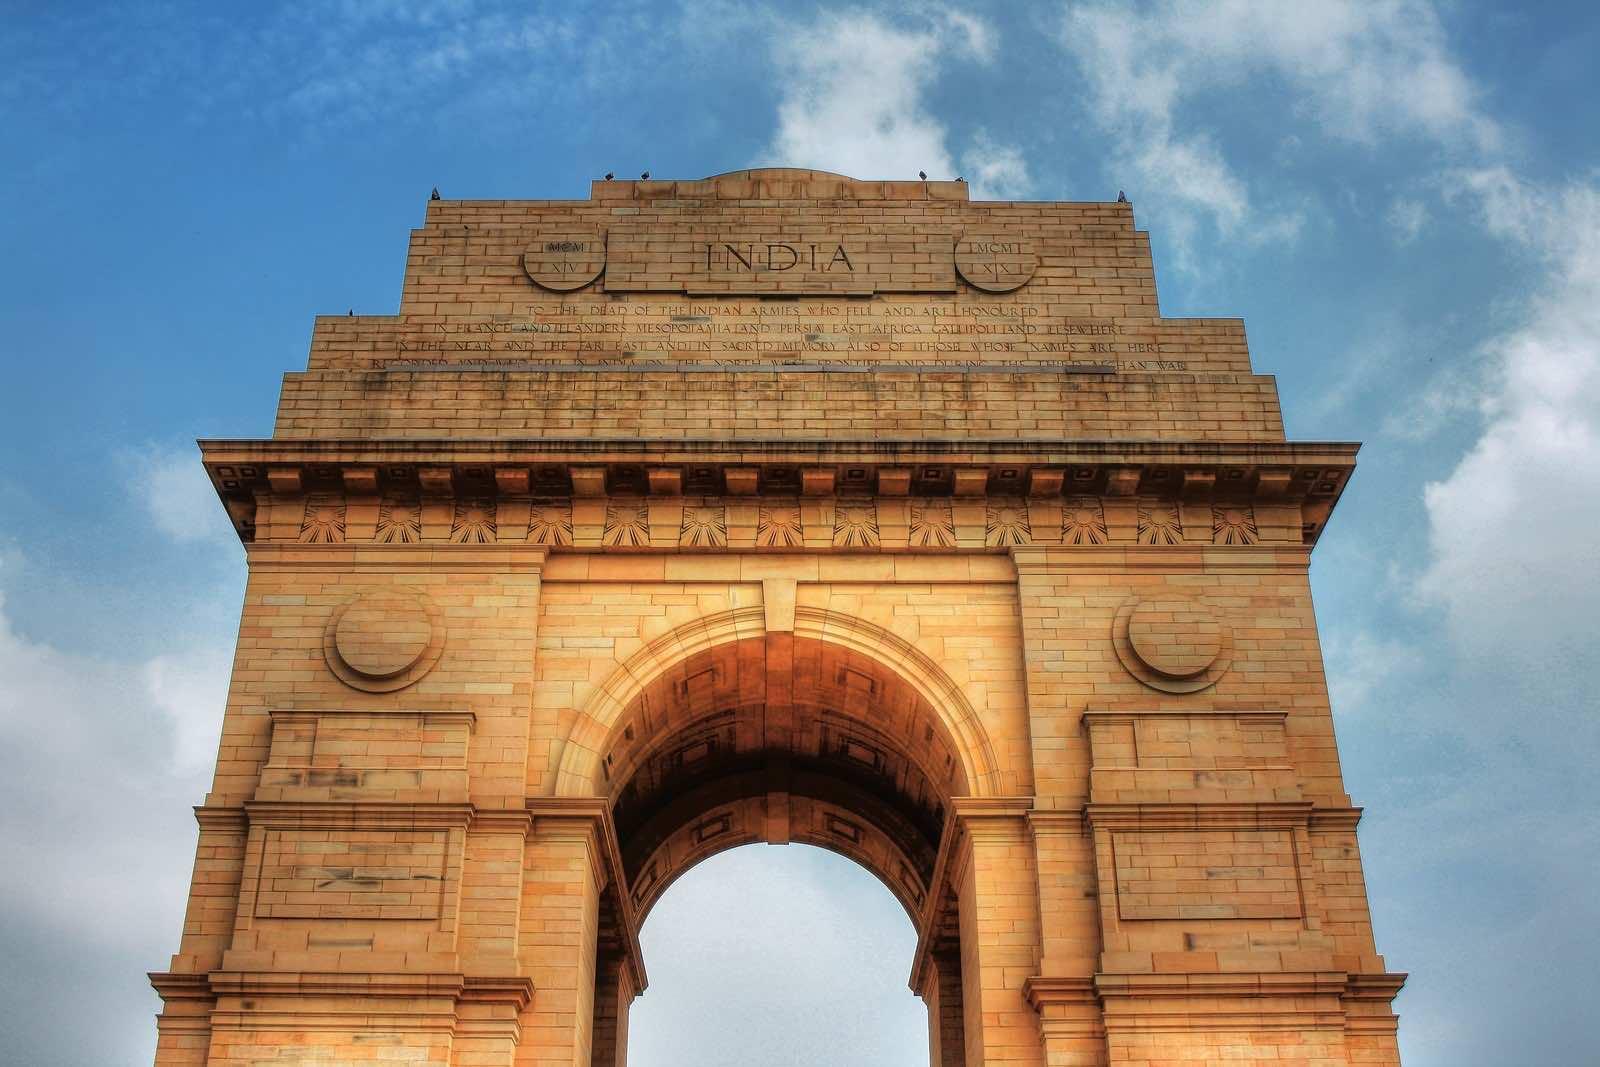 India Gate, designed by Sir Edwin Lutyens, in New Delhi (Daniel Mennerich/Flickr)